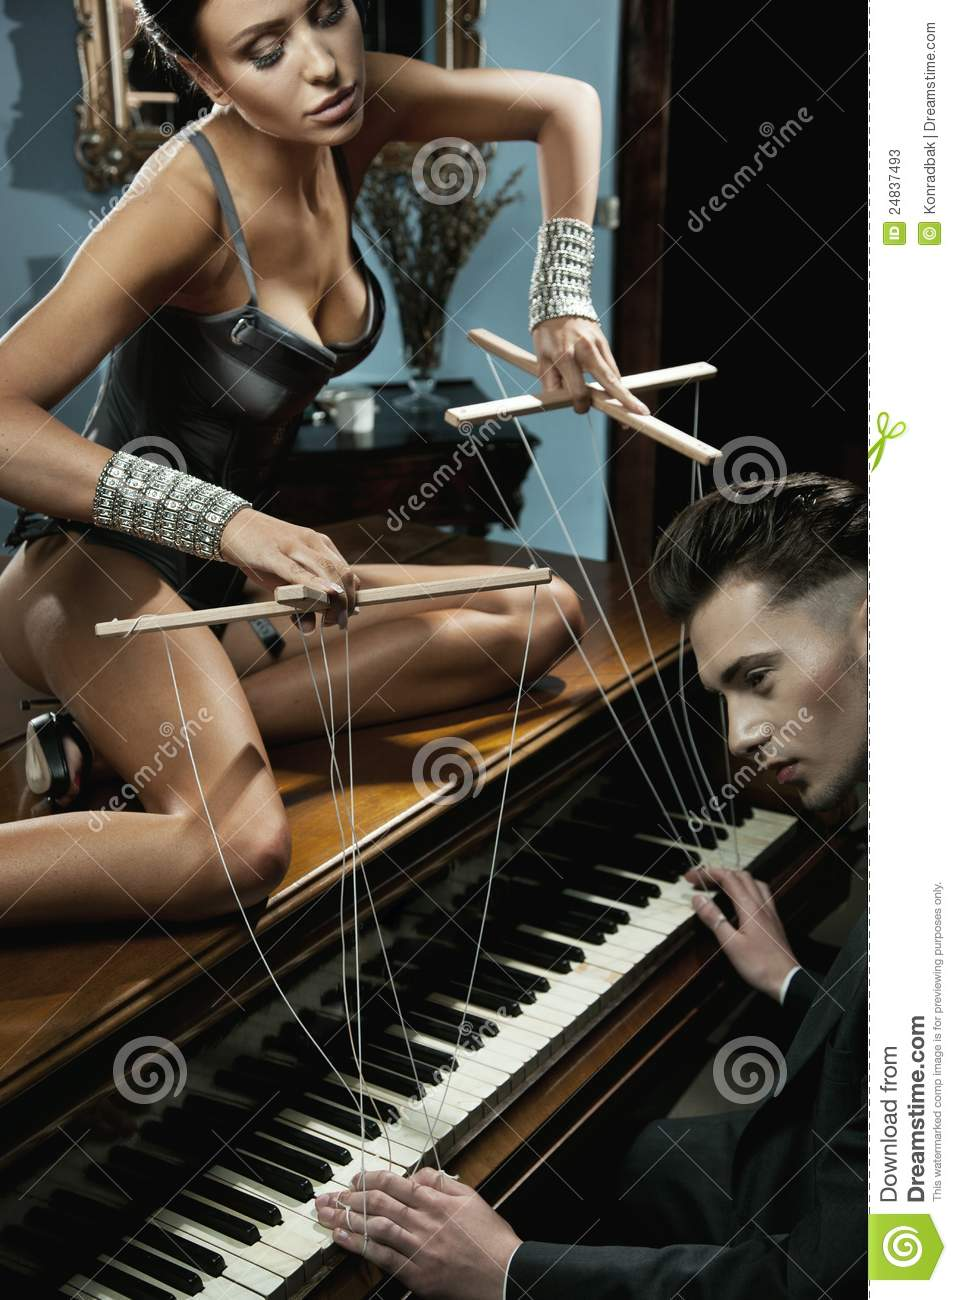 Секс на пианино картинки 26 фотография